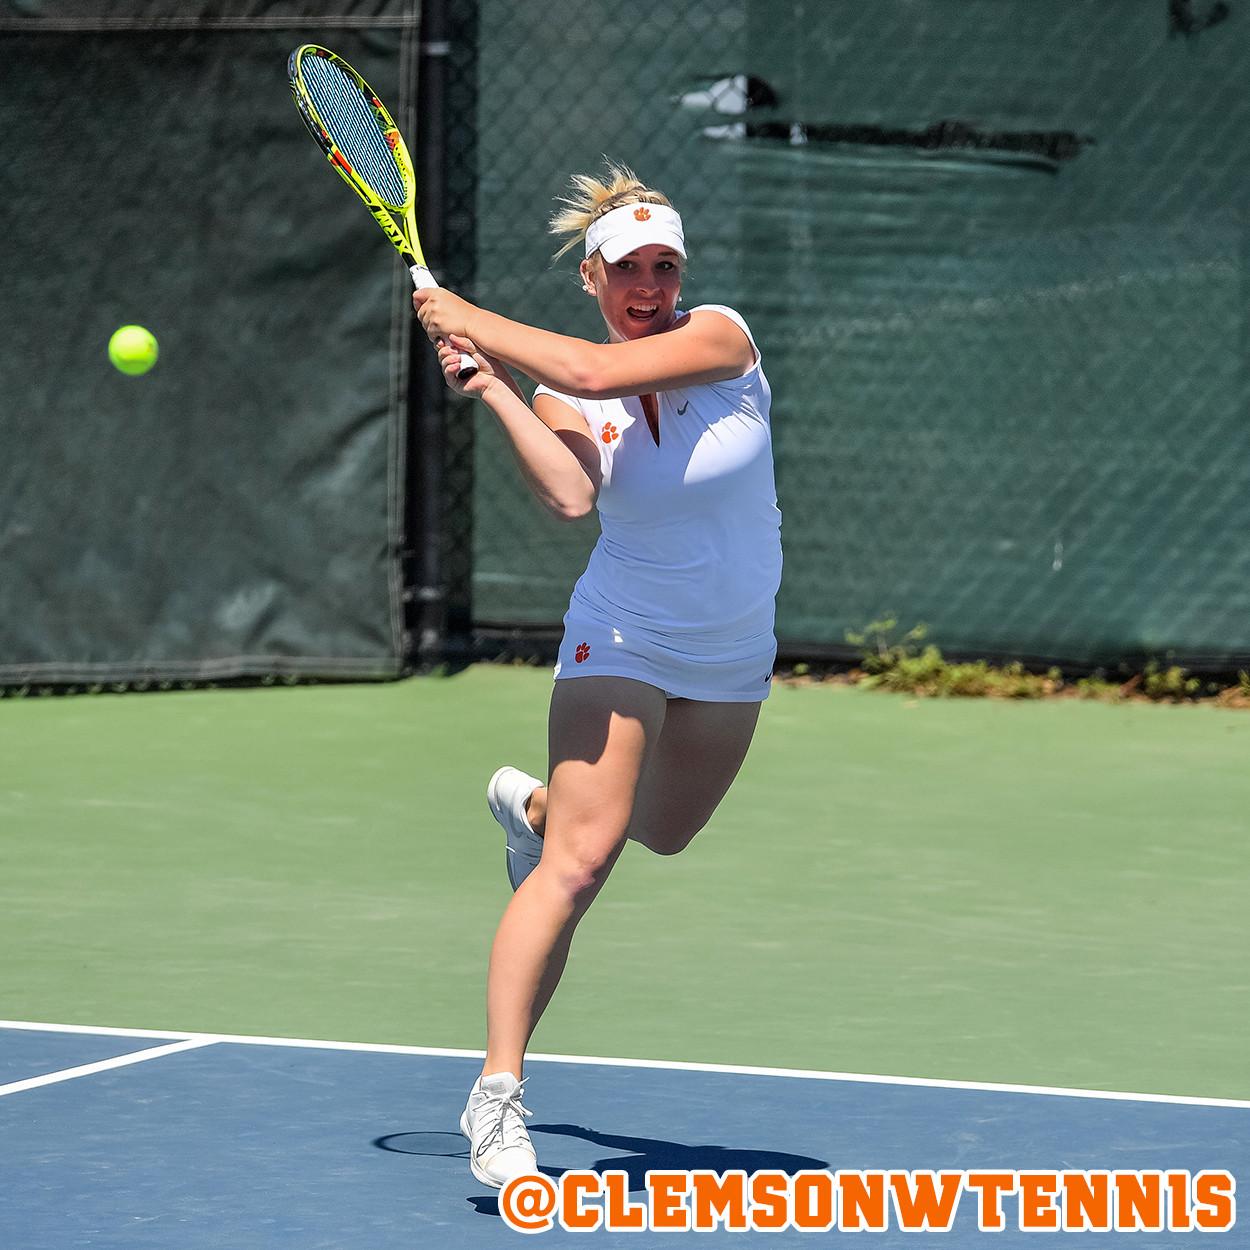 Eidukonyte Advances in NCAA Singles Championship